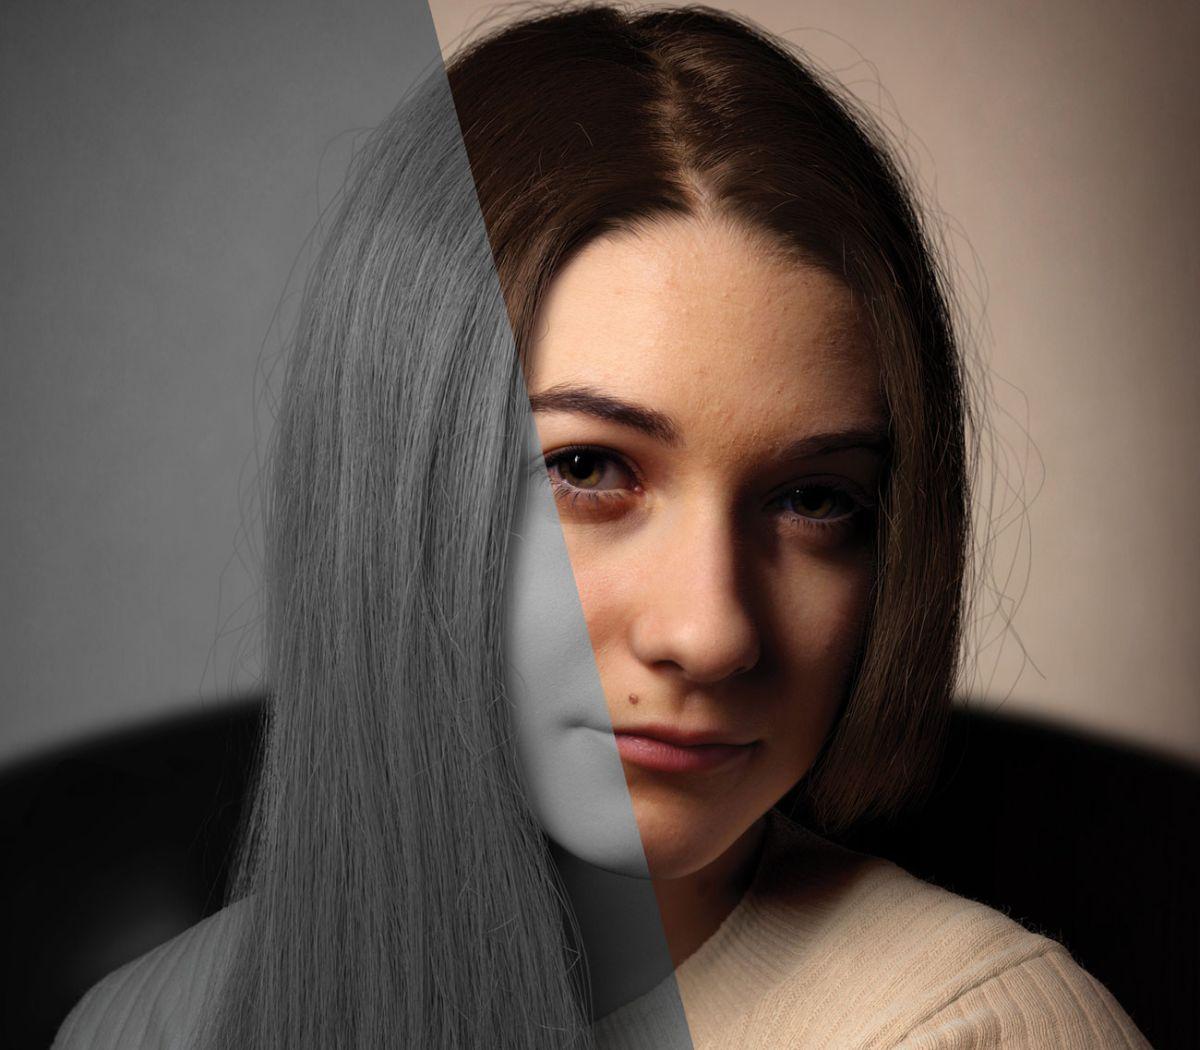 Create a lifelike digital human | Creative Bloq